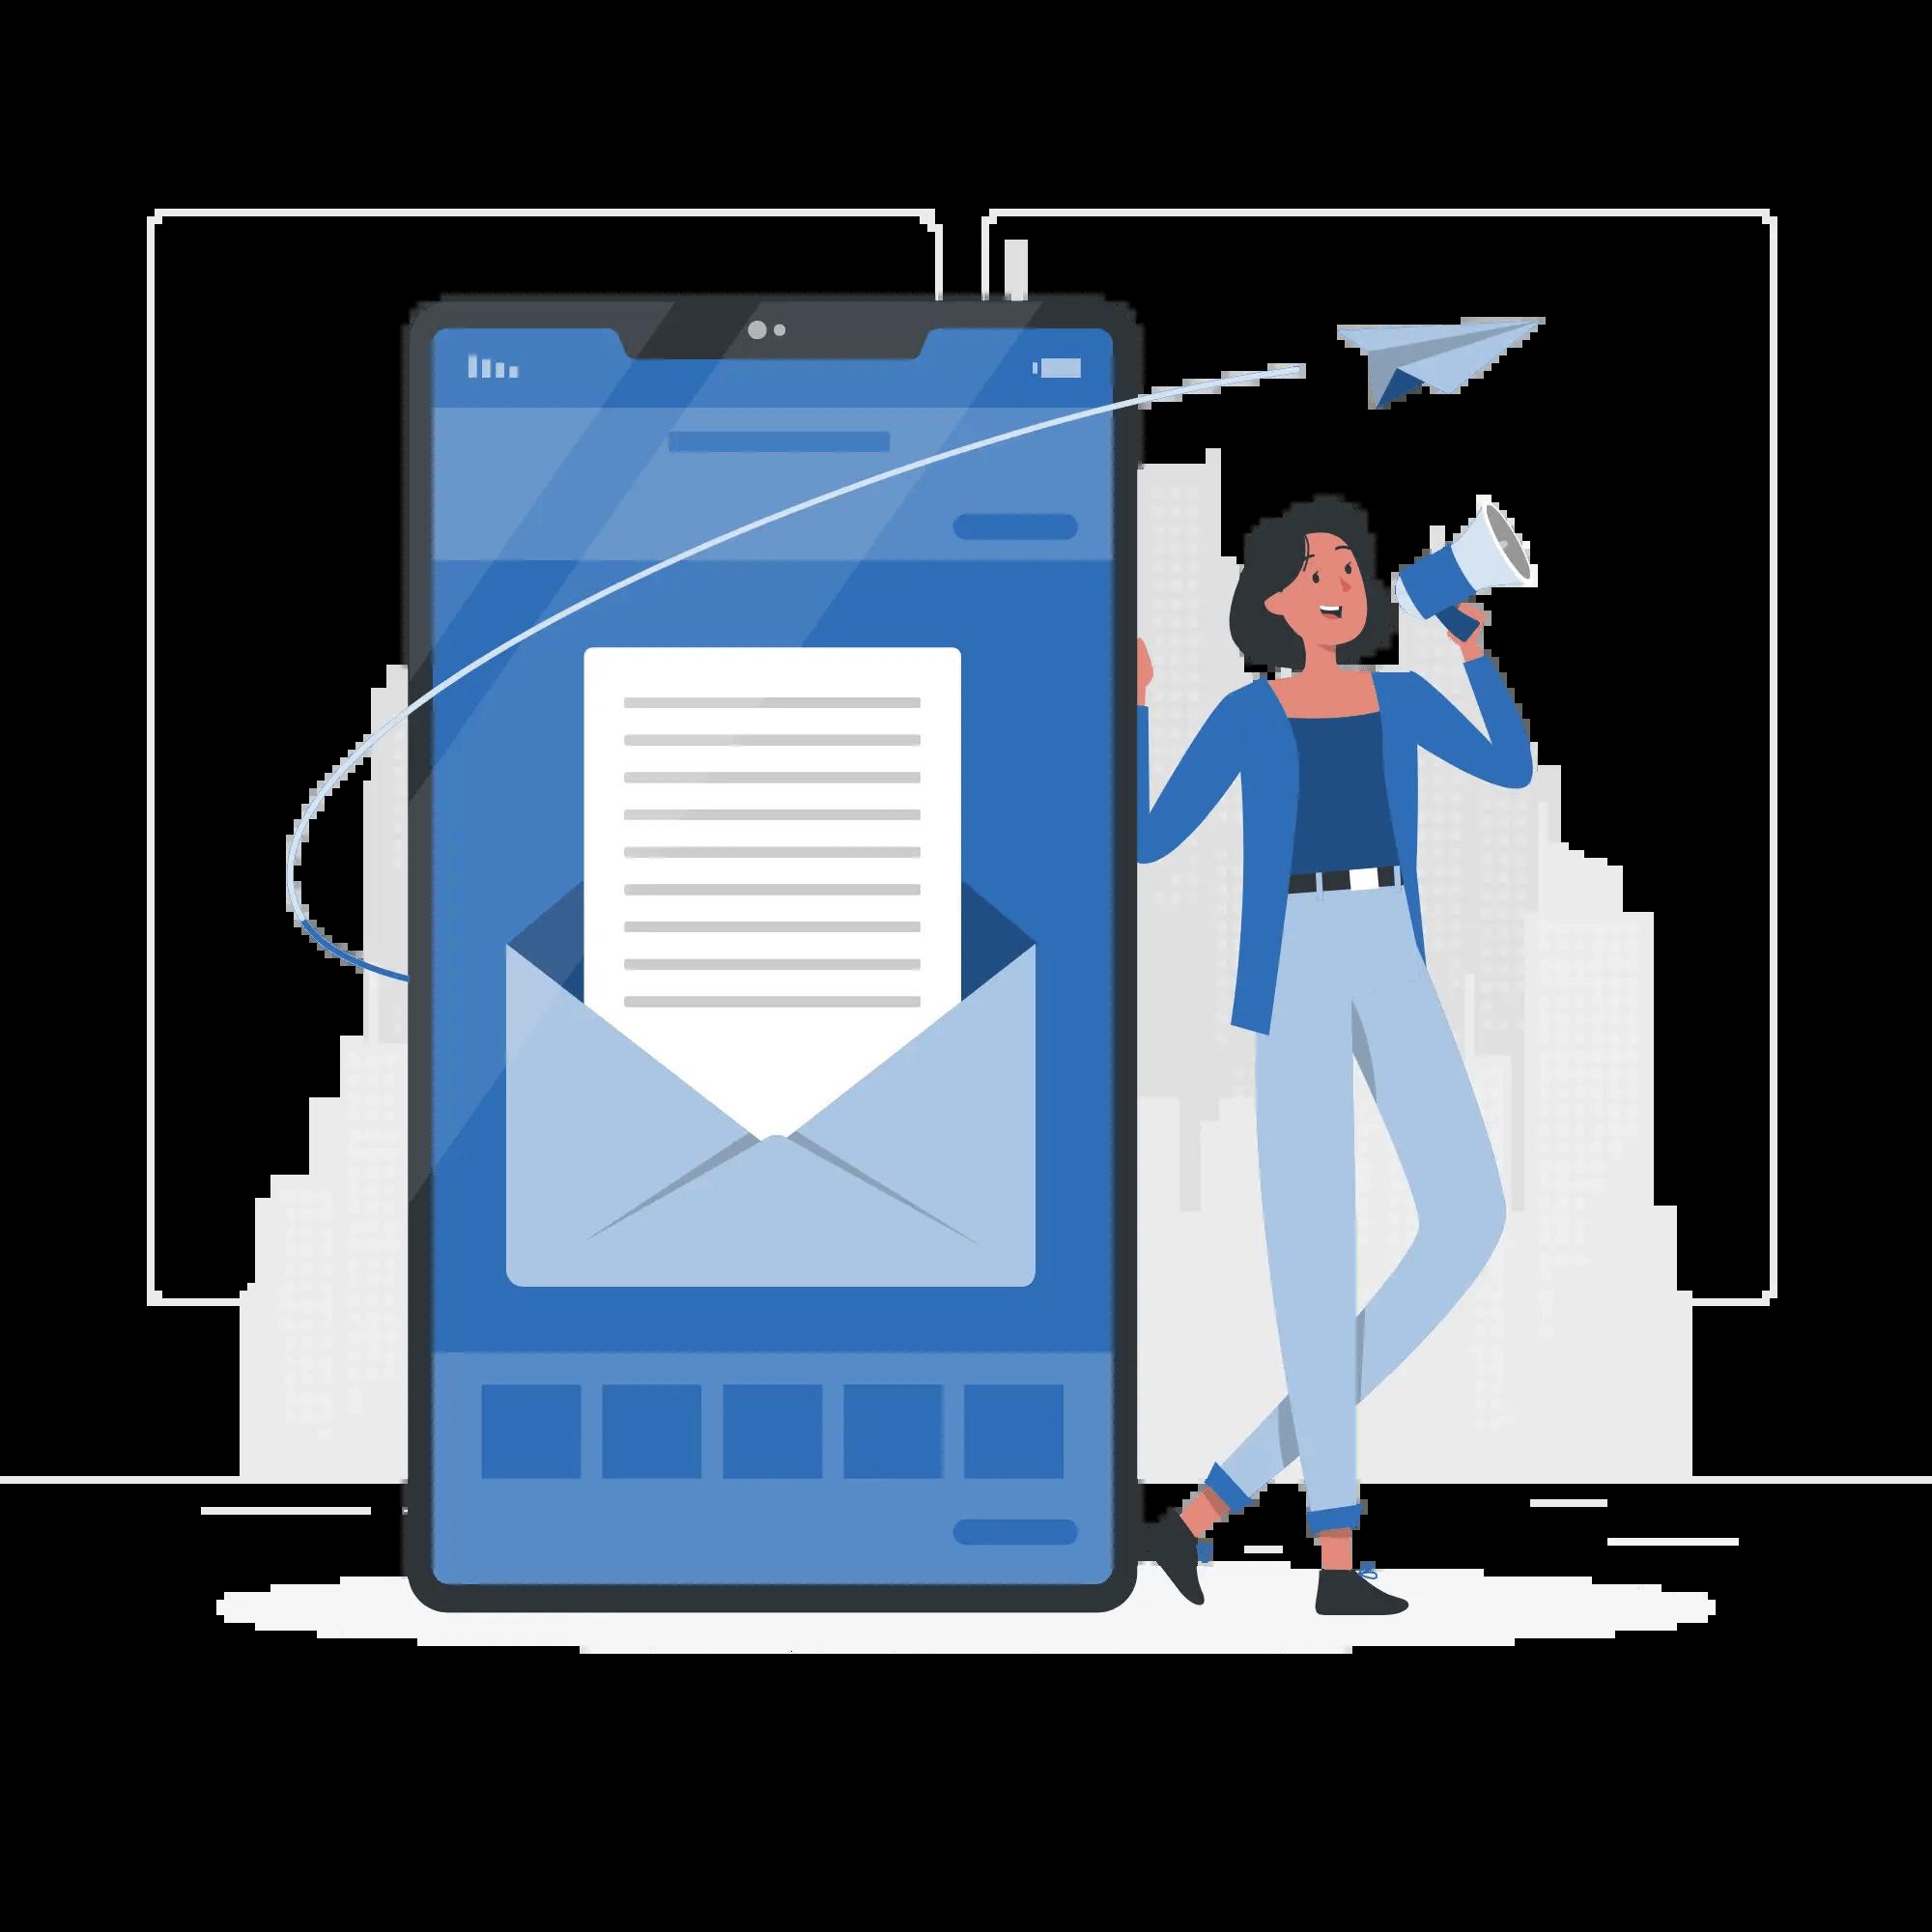 Email_campaign-rafiki